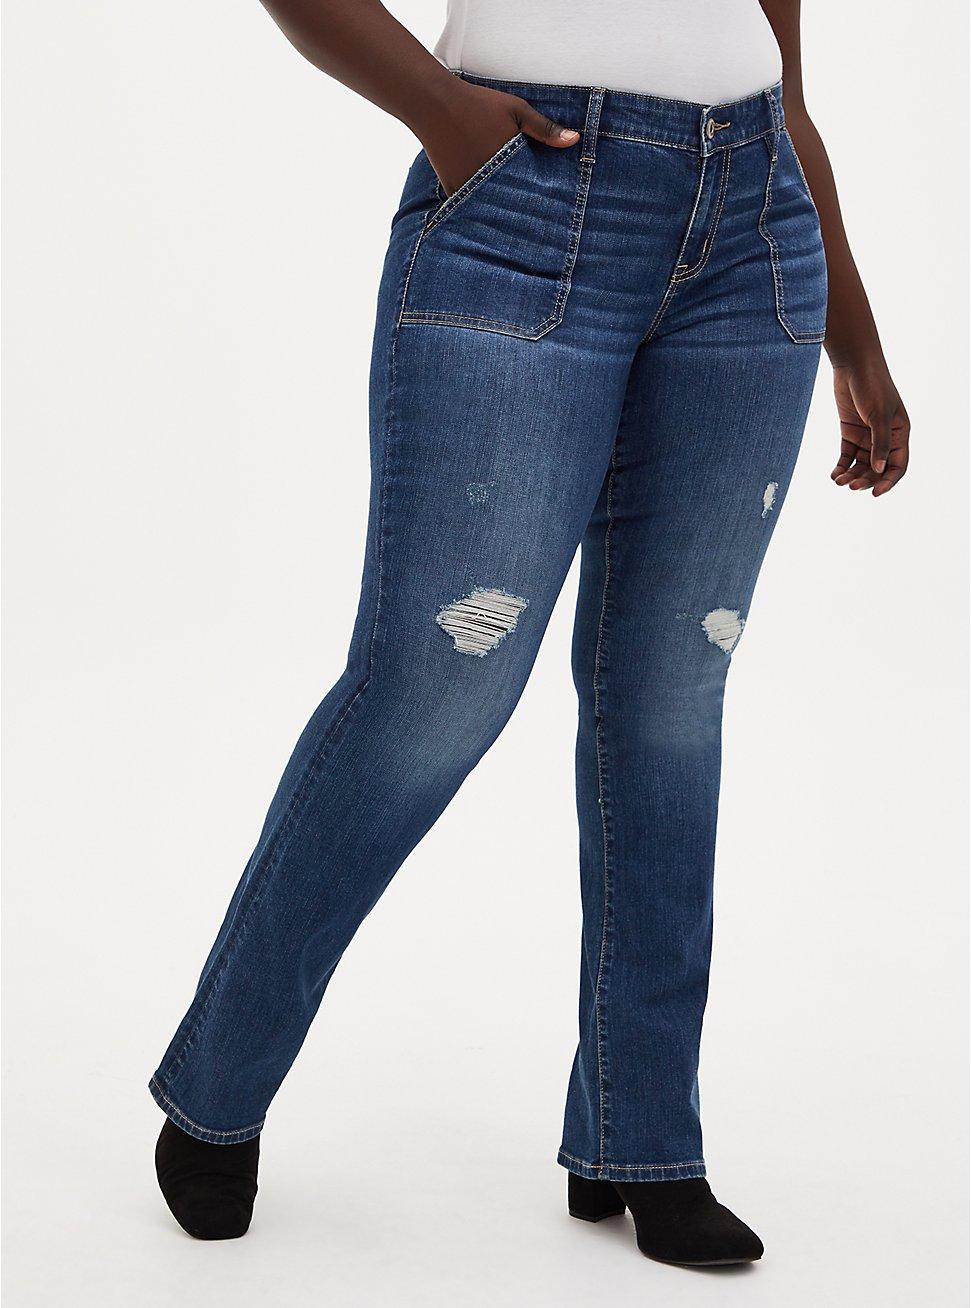 Mid Rise Slim Boot Jean - Vintage Stretch Eco Medium Wash, , fitModel1-hires